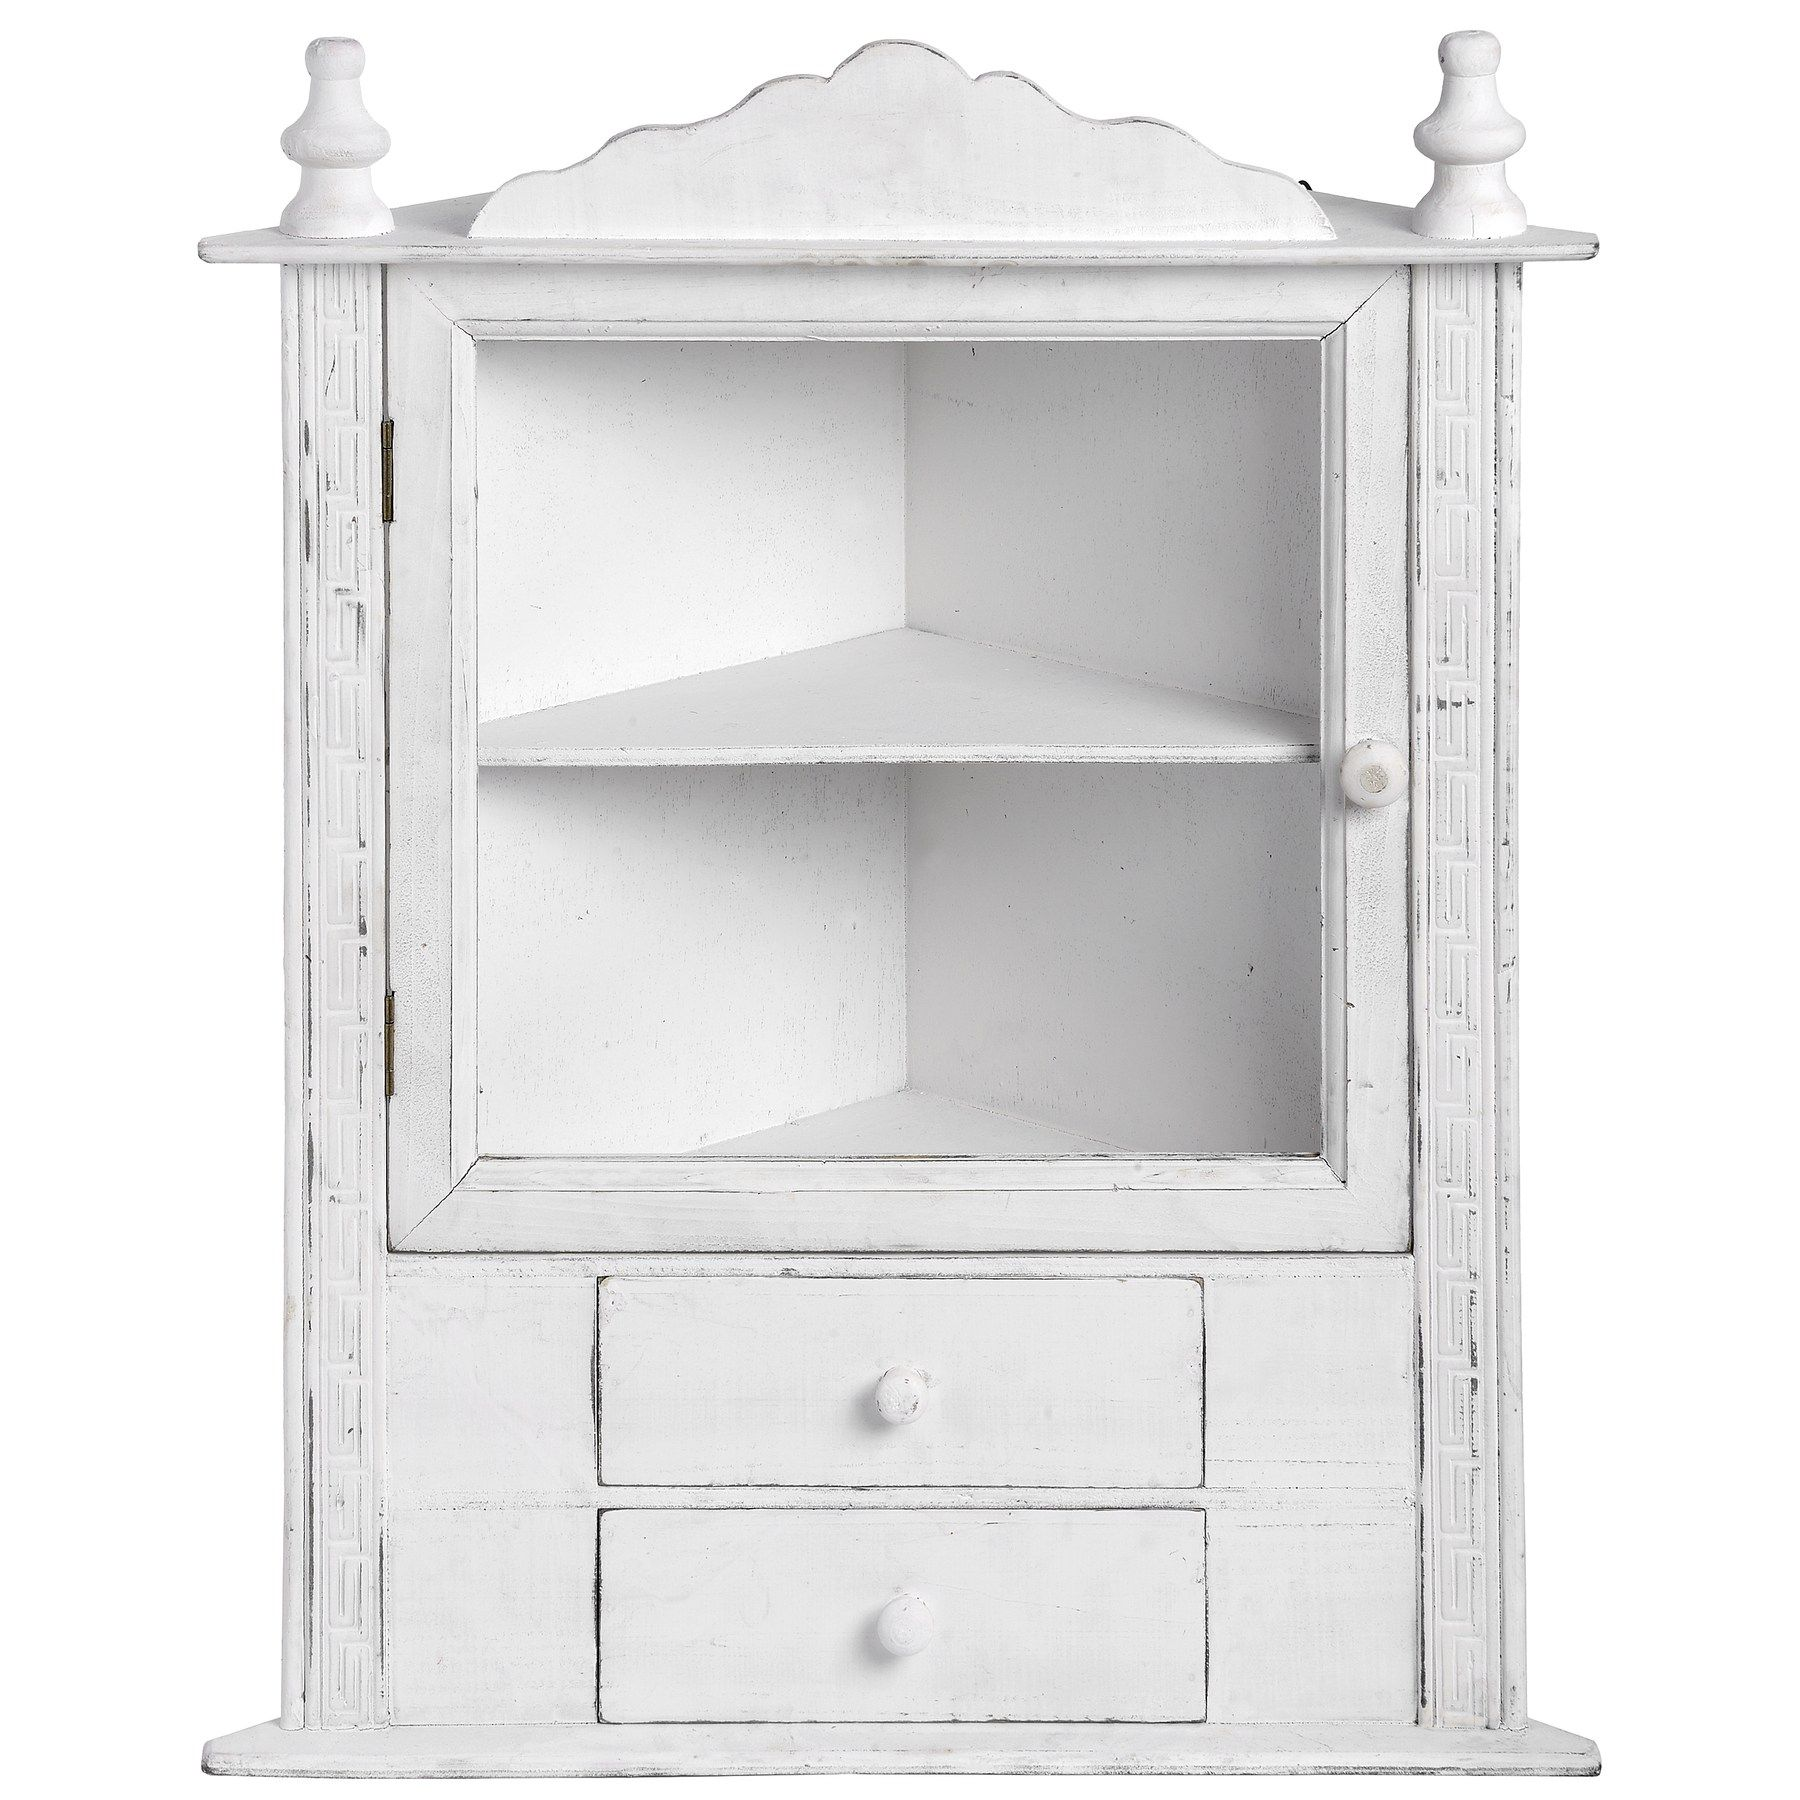 Antique White Distressed Wooden Corner Cabinet